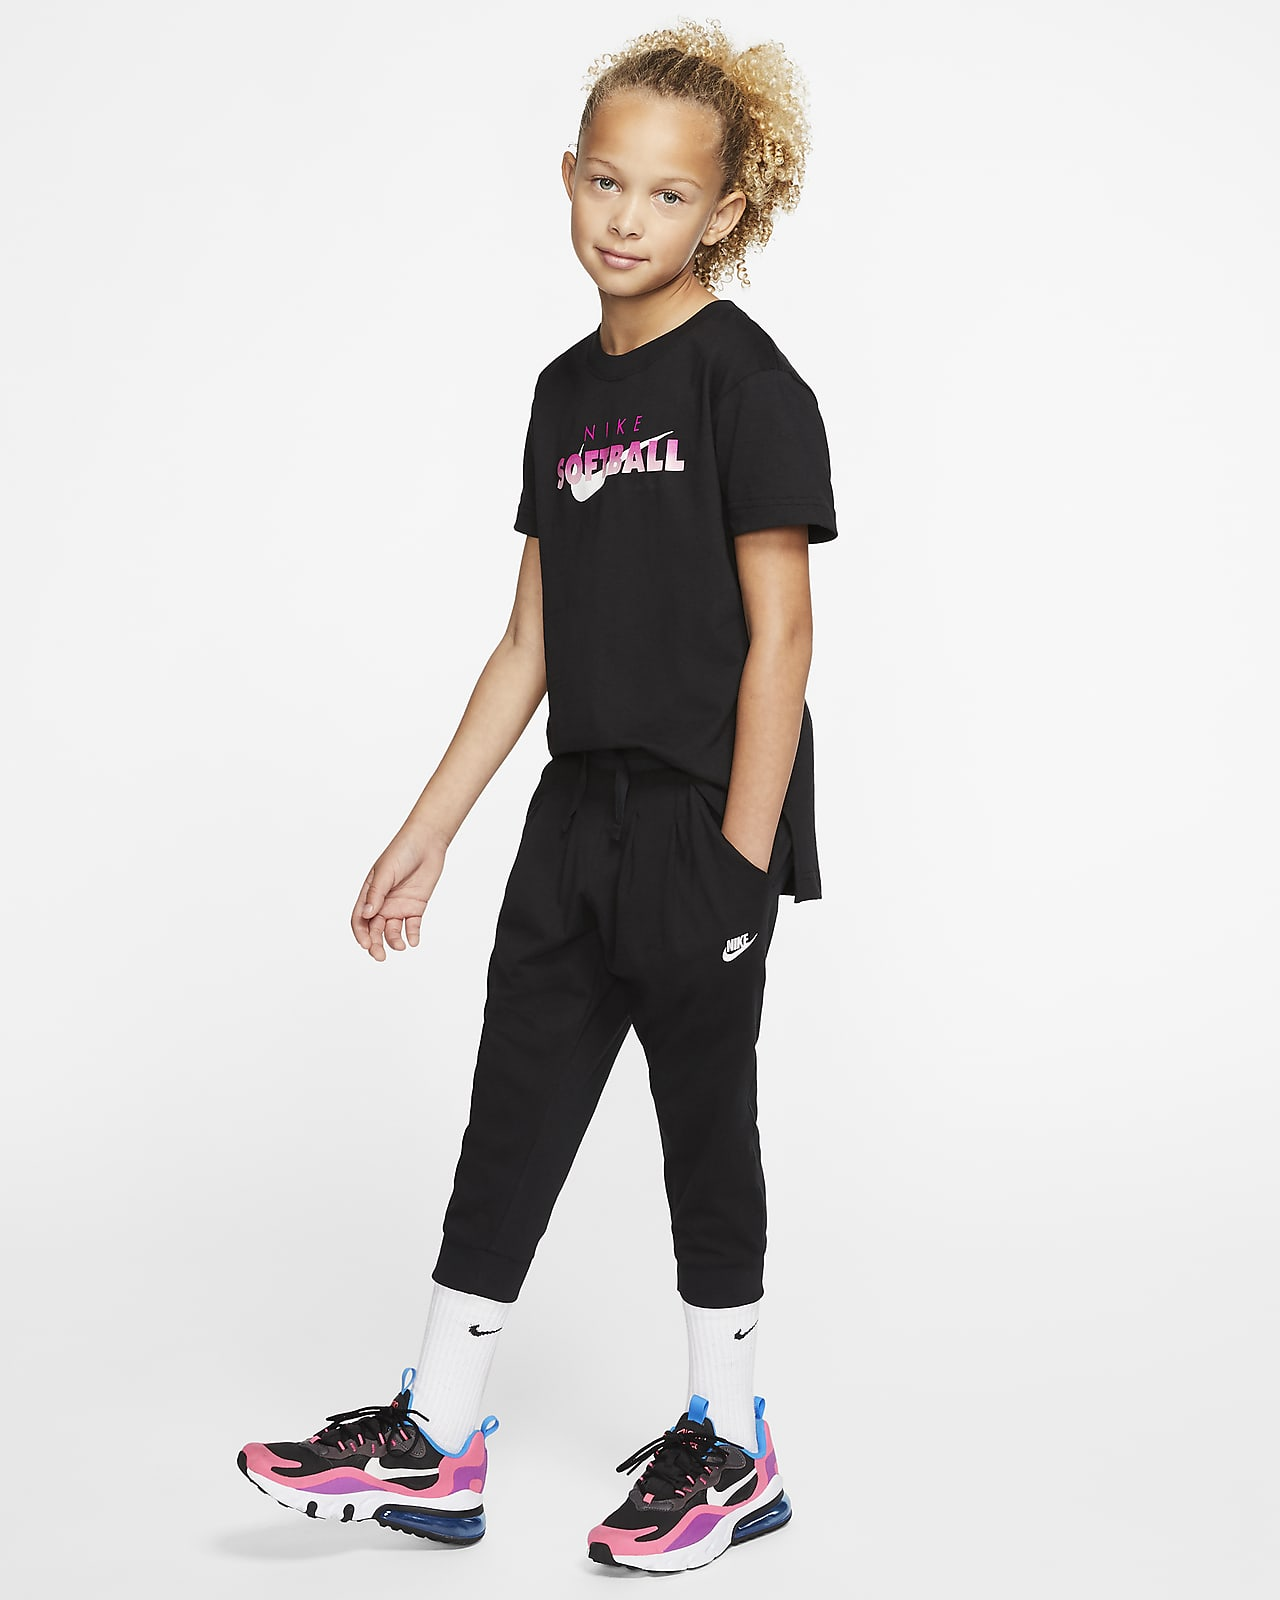 Nike Sportswear Big Kids' (Girls') Capris. Nike.com